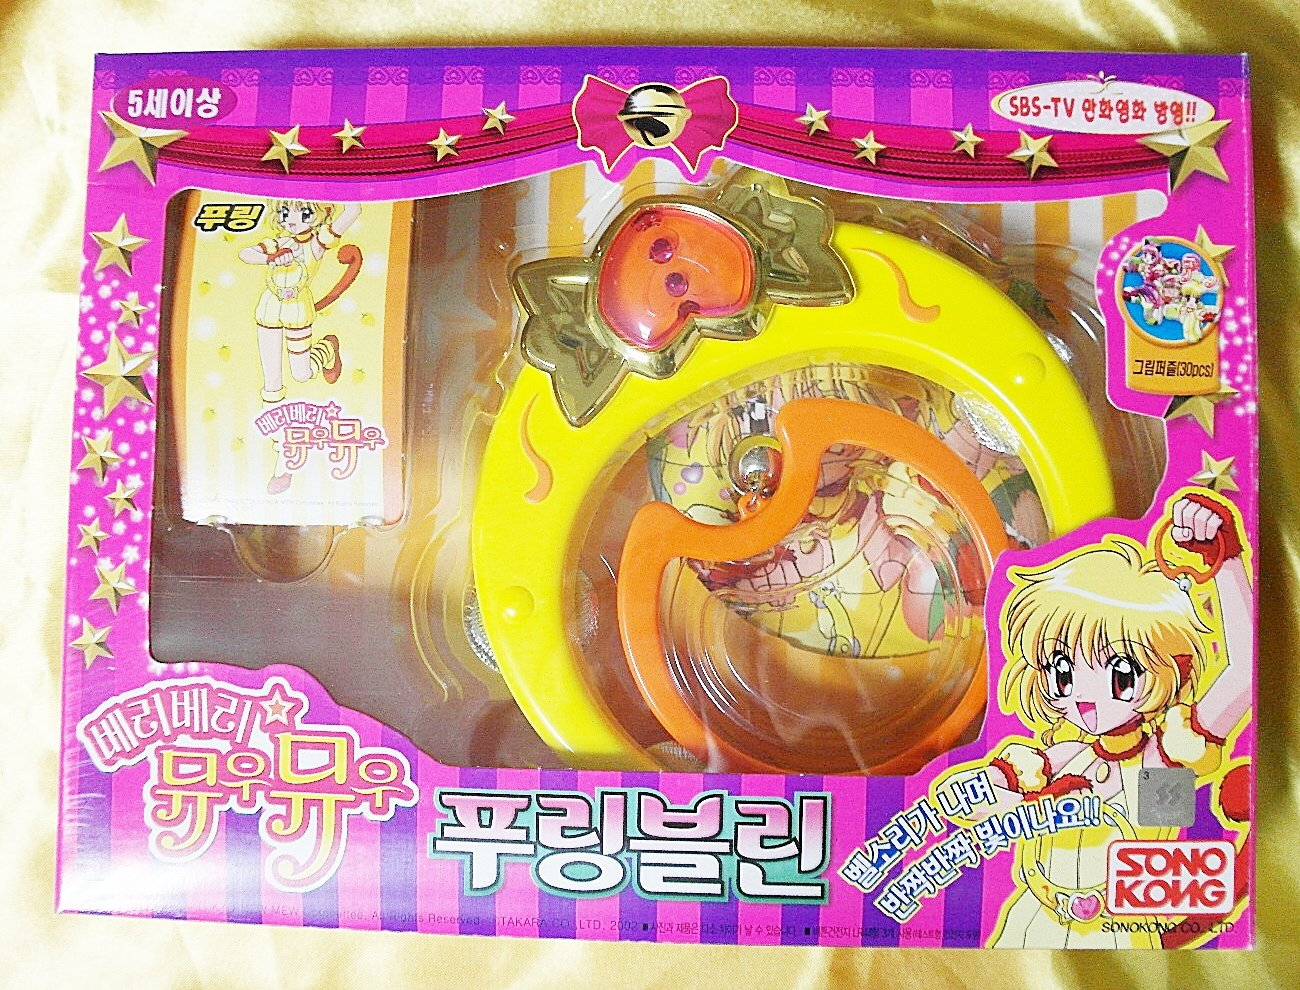 Tokyo Mew Mew Pudding Ring Manga Character Item -Takara Sonokong Yellow Orange